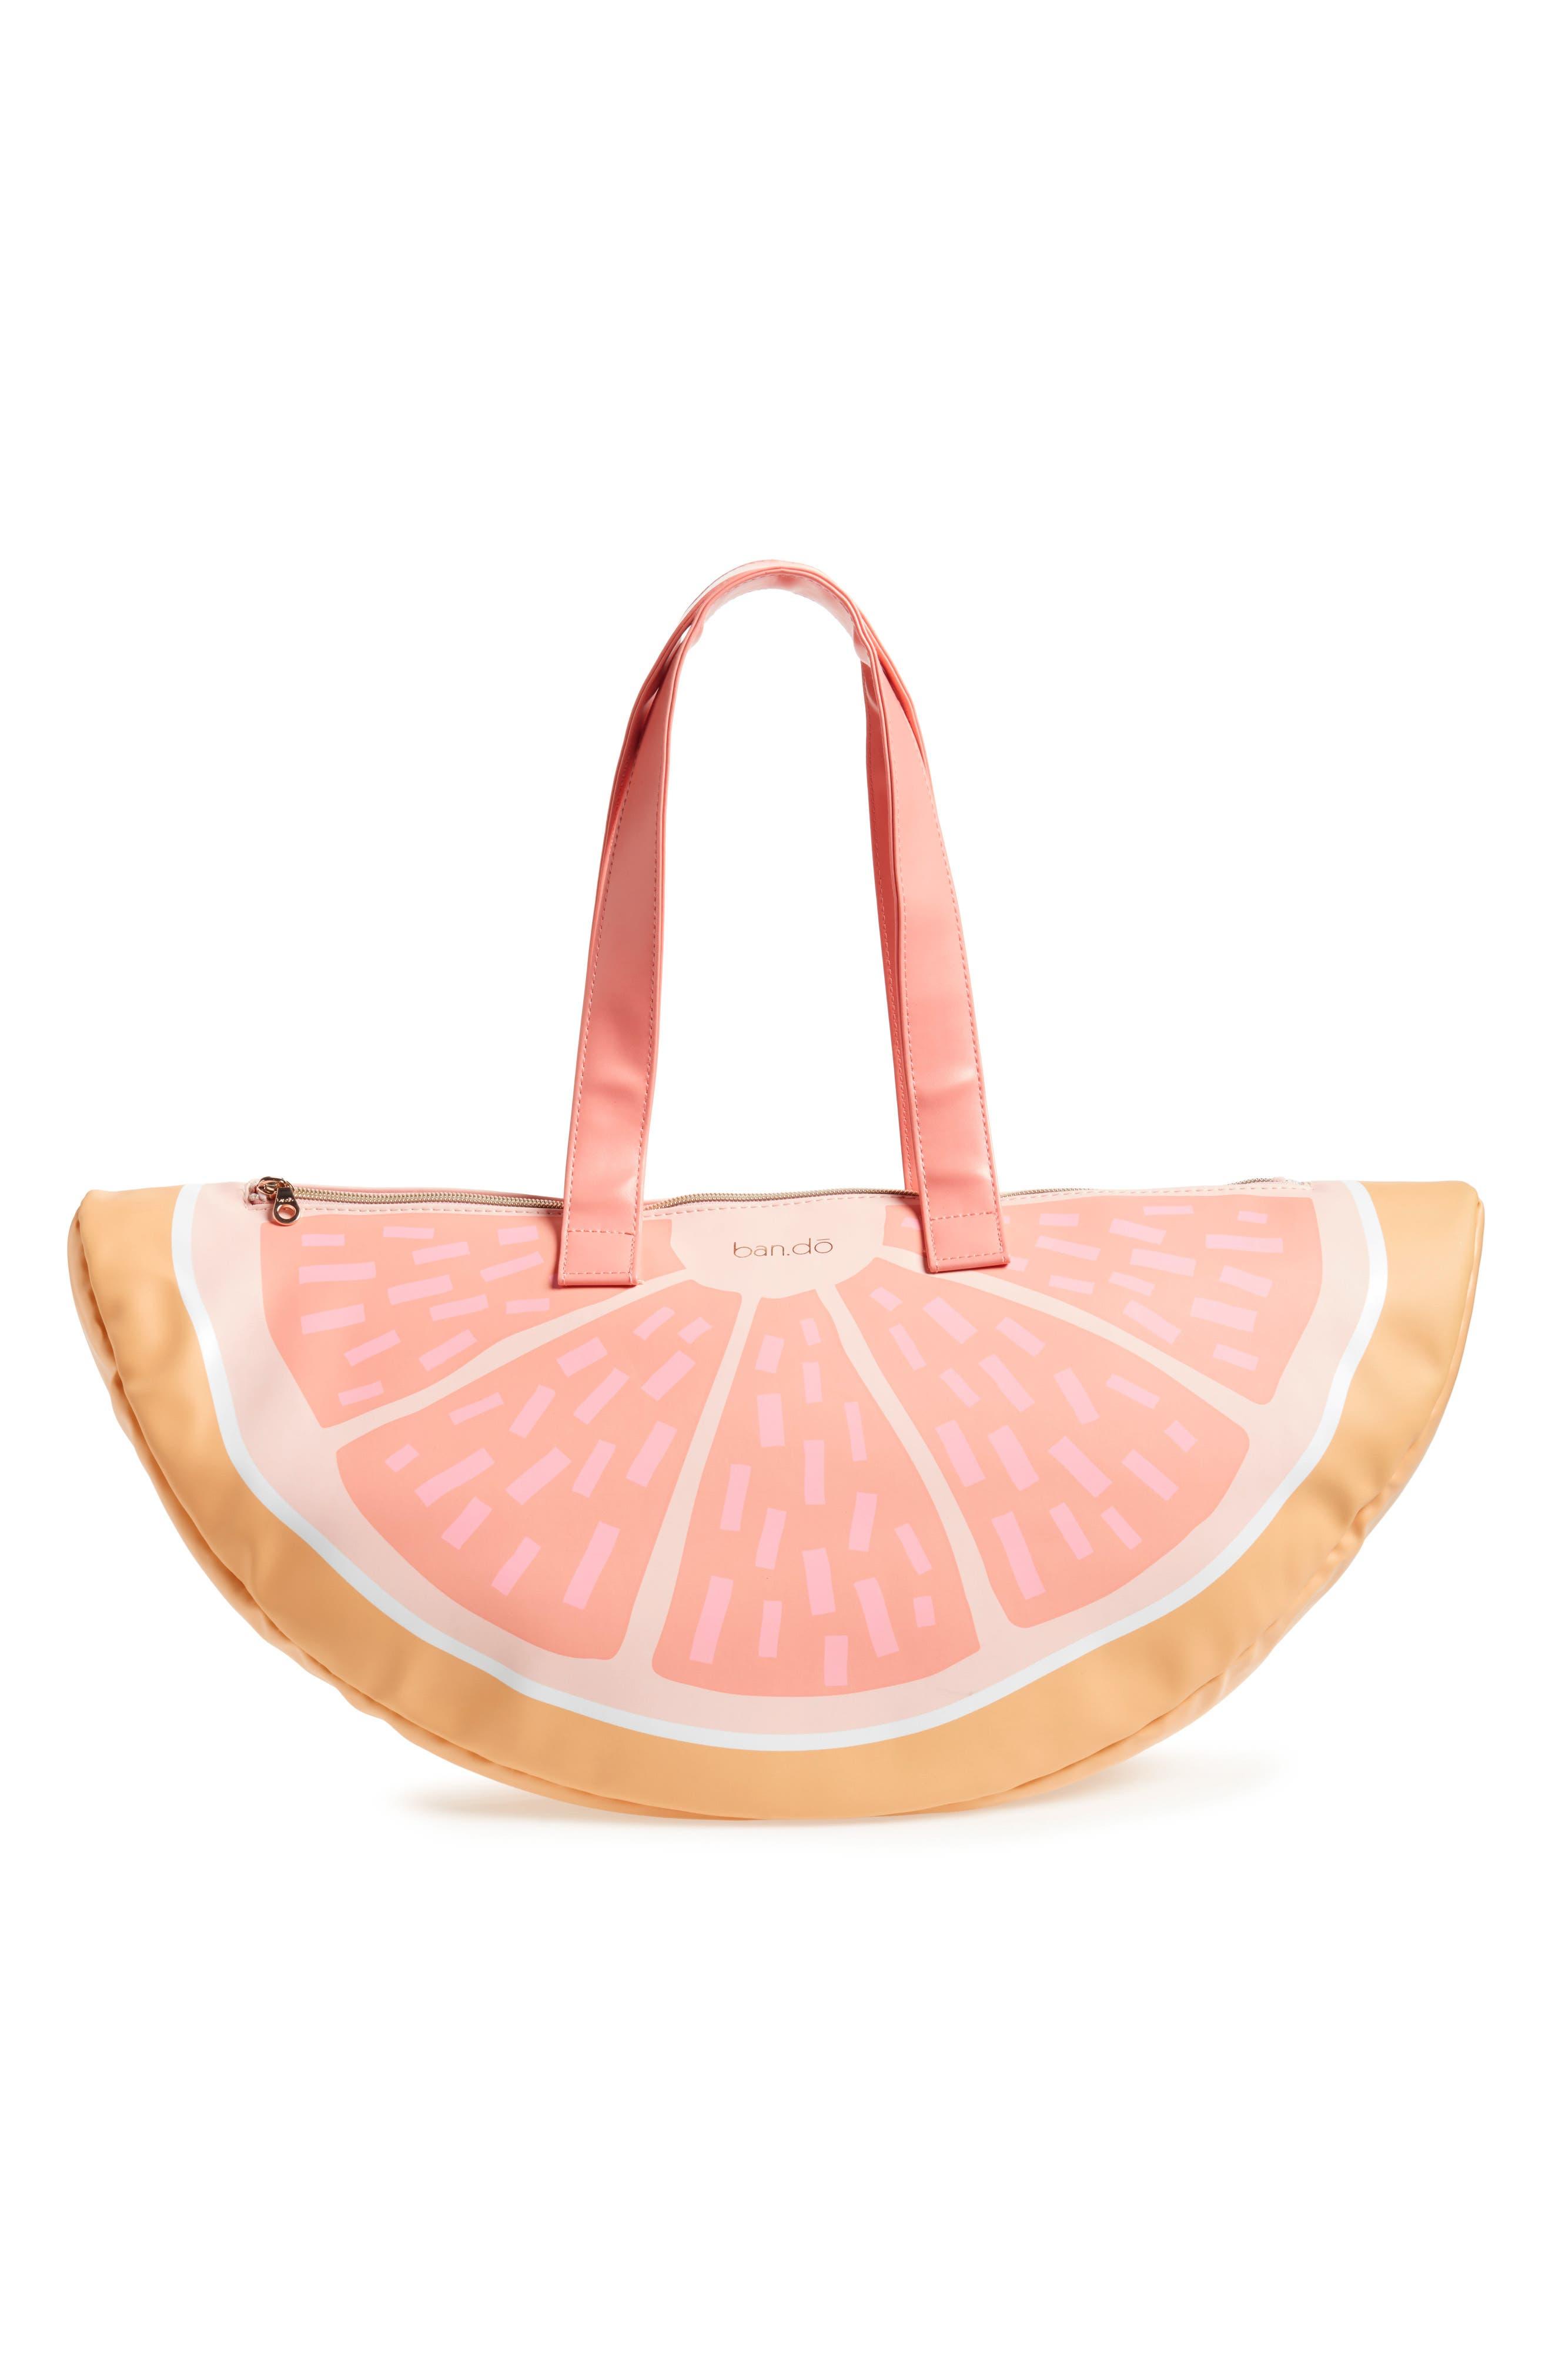 Grapefruit Cooler Bag,                             Main thumbnail 1, color,                             950